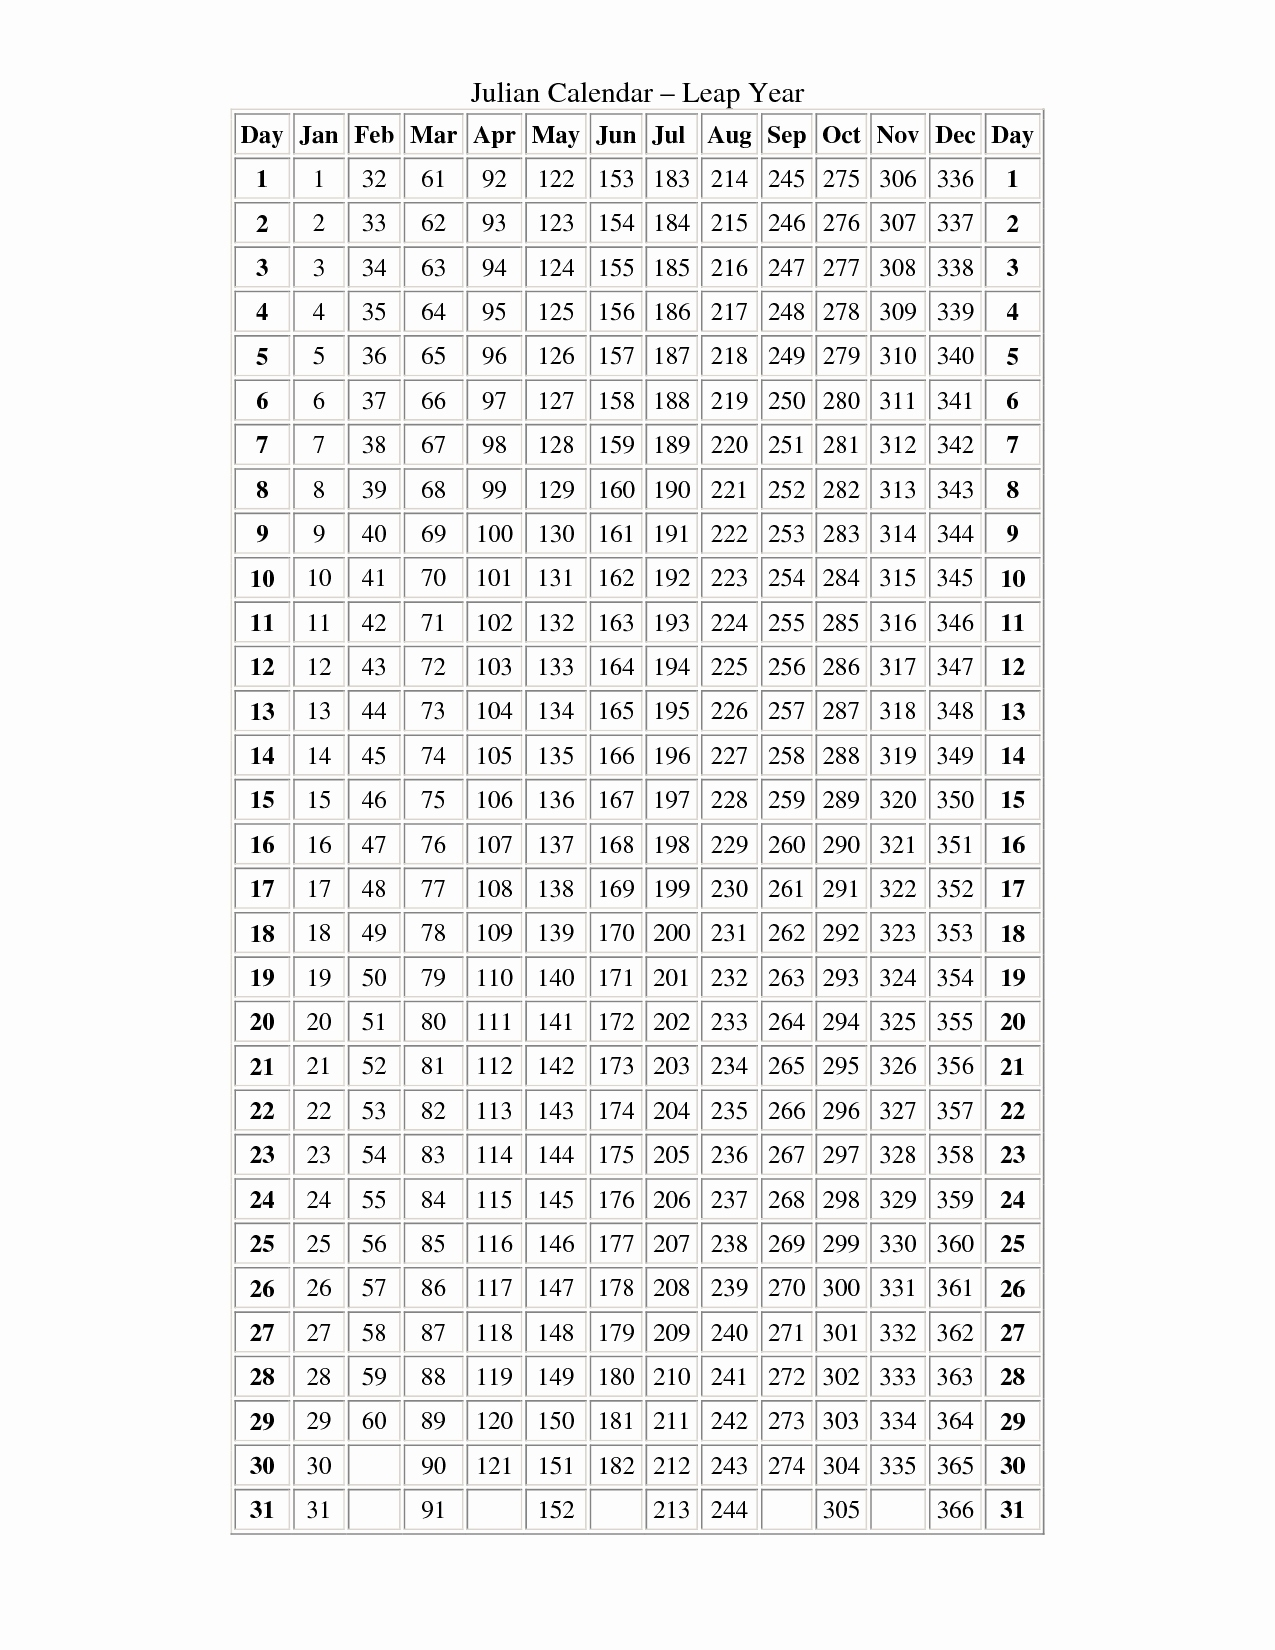 Perpetual Julian Calendar | Printable Calendar Template 2021